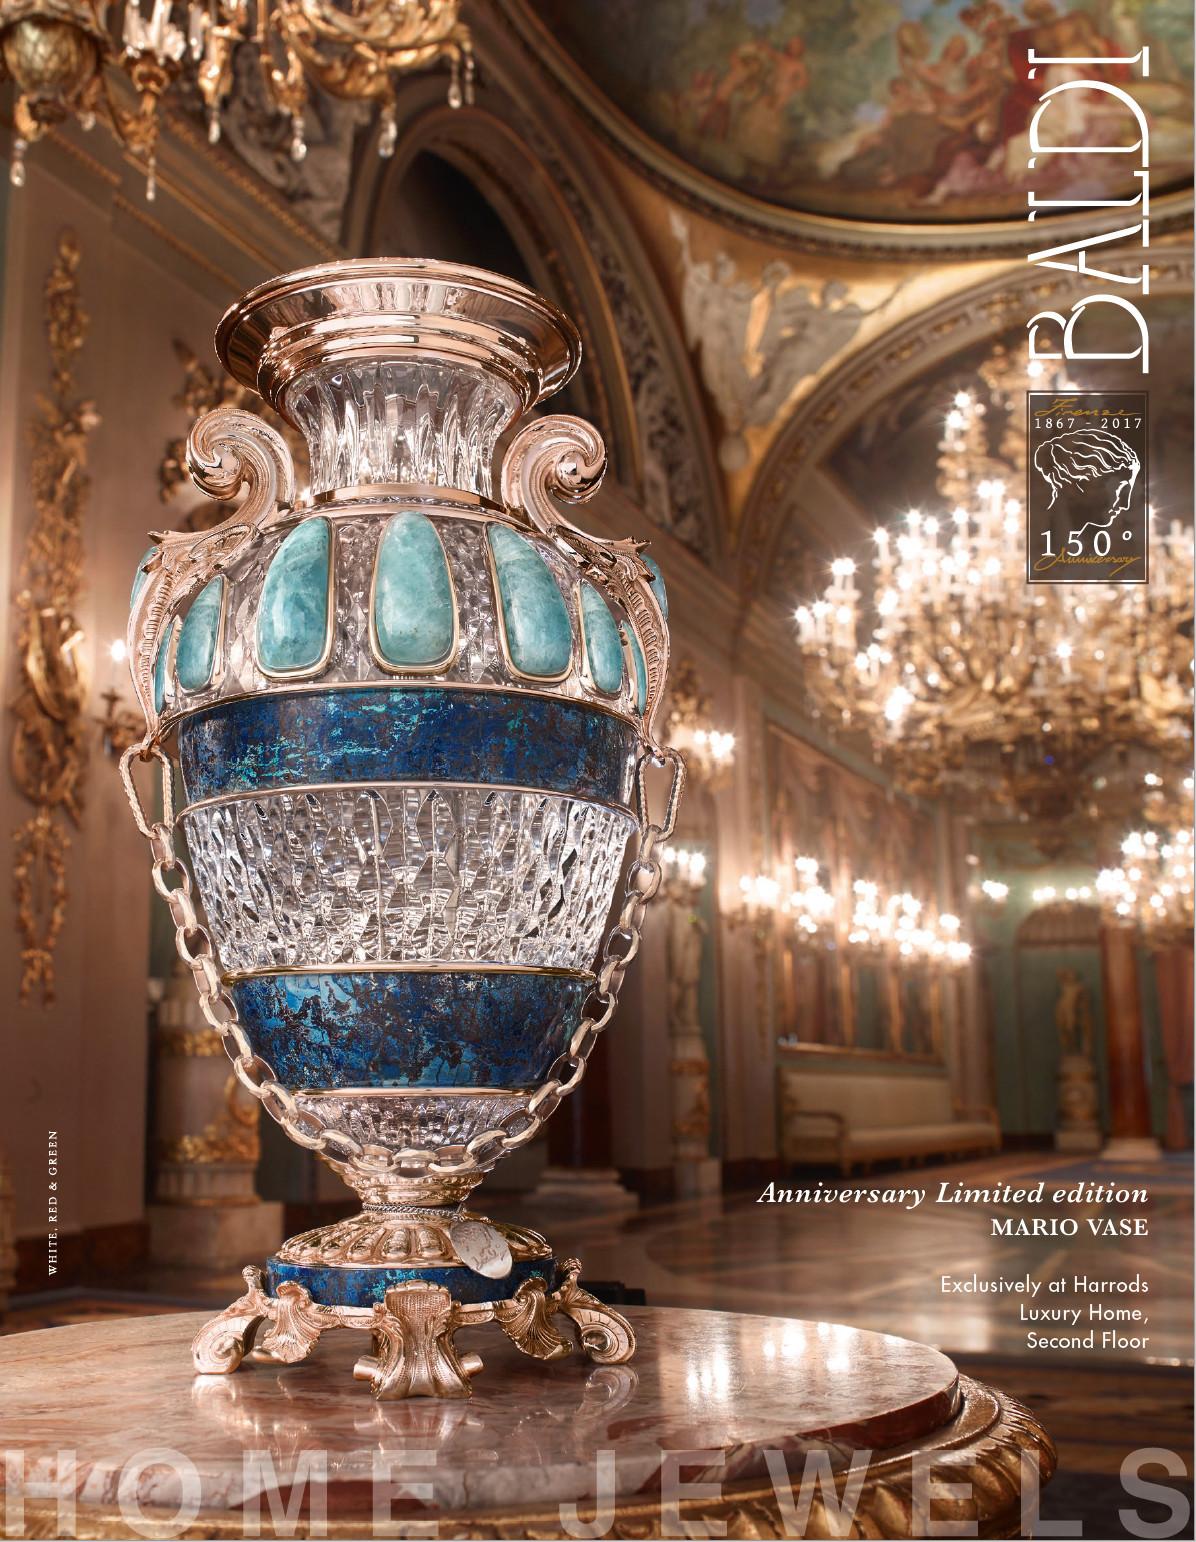 large red decorative vases of baldi home jewels mario vase firenze page harrods magazine pertaining to baldi home jewels mario vase firenze page harrods magazine